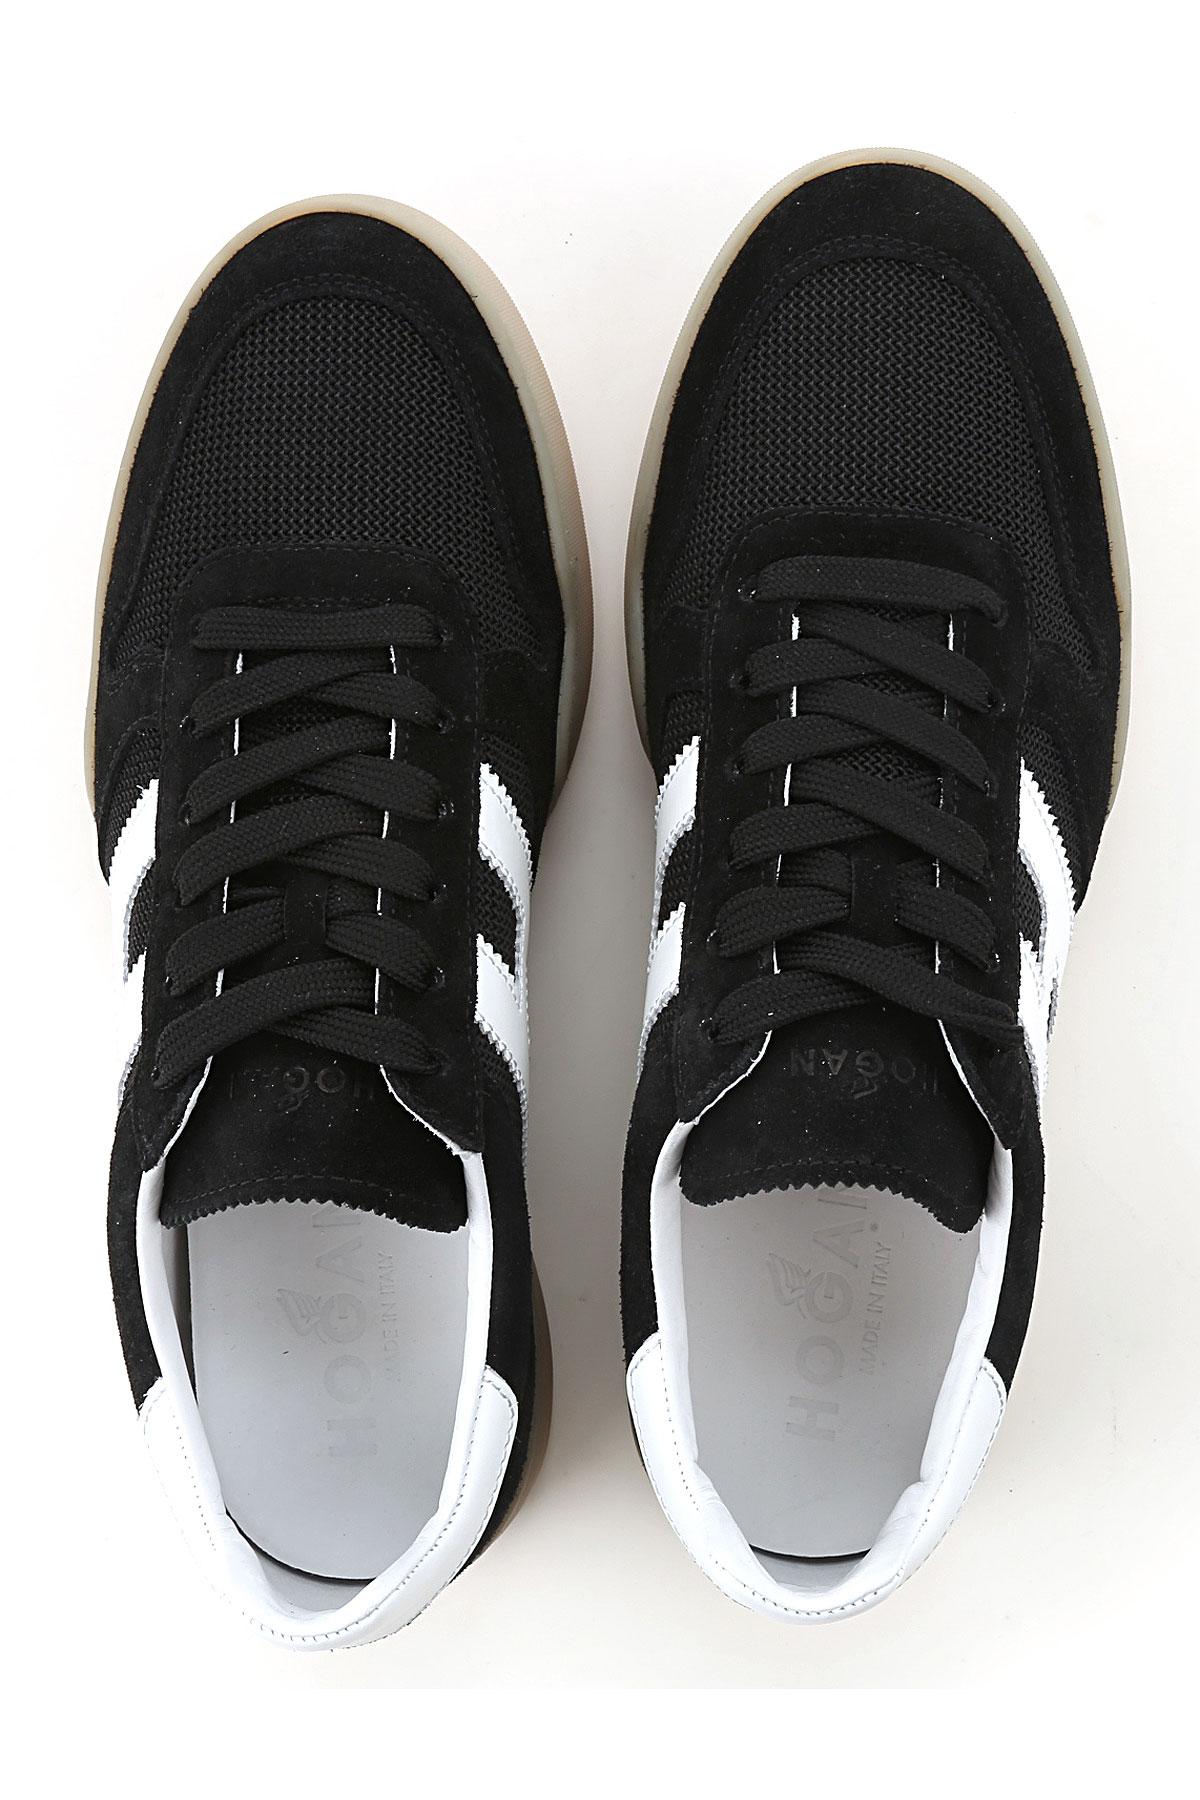 Scarpe Uomo Sneakers Hogan Offerte Limitate